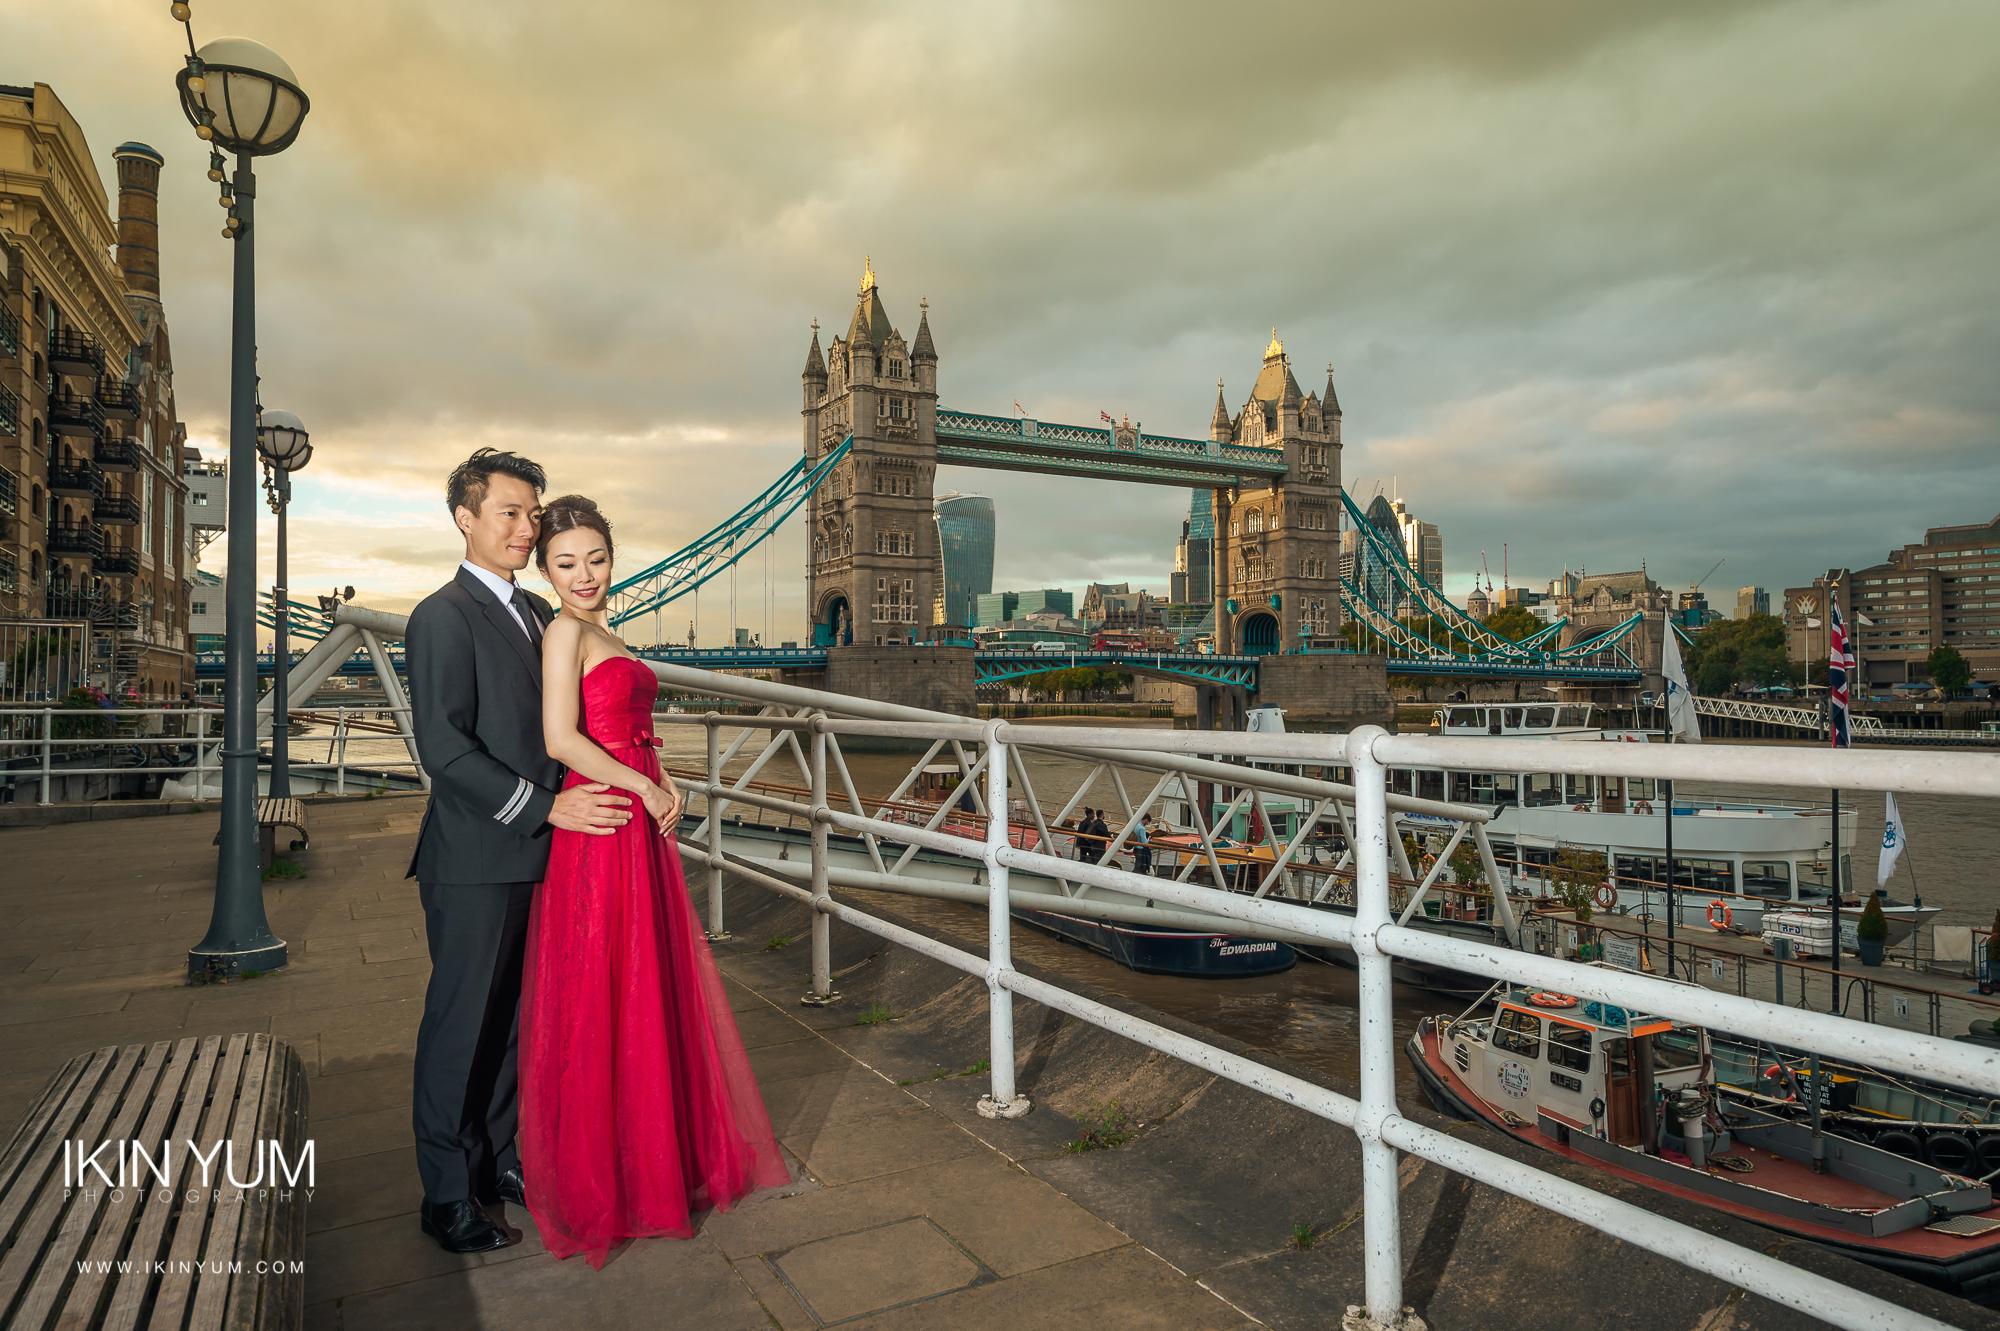 Yannis & Kenny Pre-Wedding Shoot - Ikin Yum Photography-0159.jpg